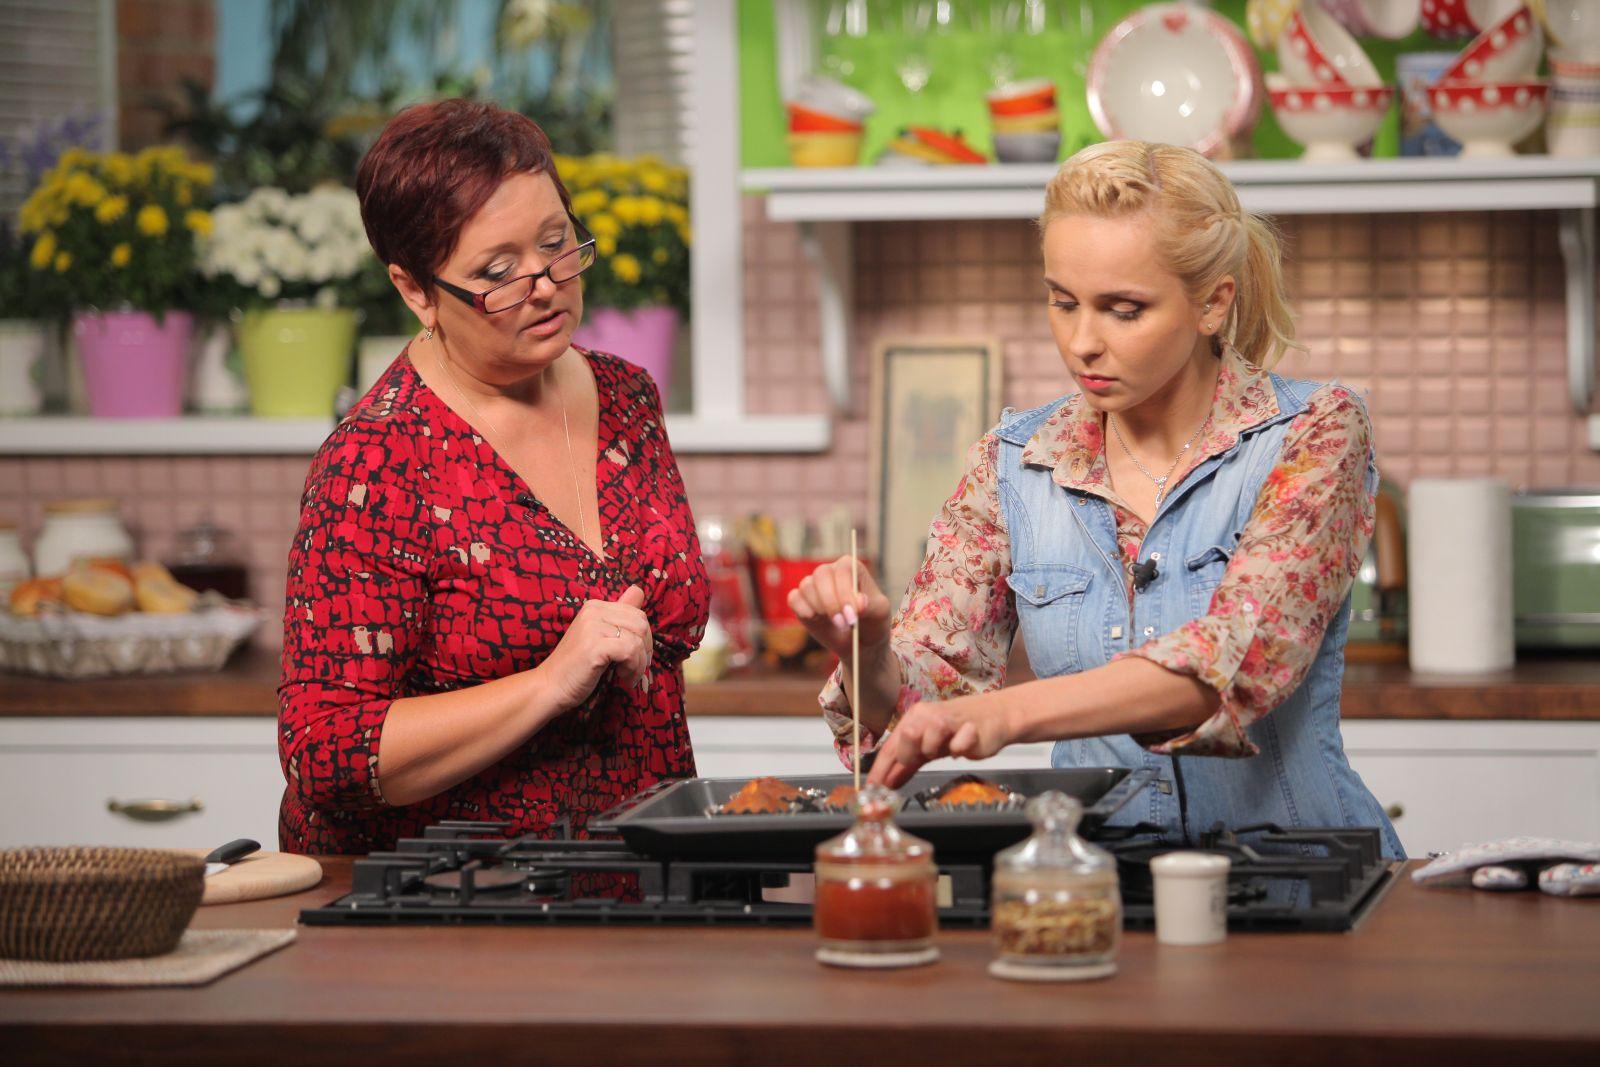 Лилия Ребрик накормила мужа подгоревшими пирожками